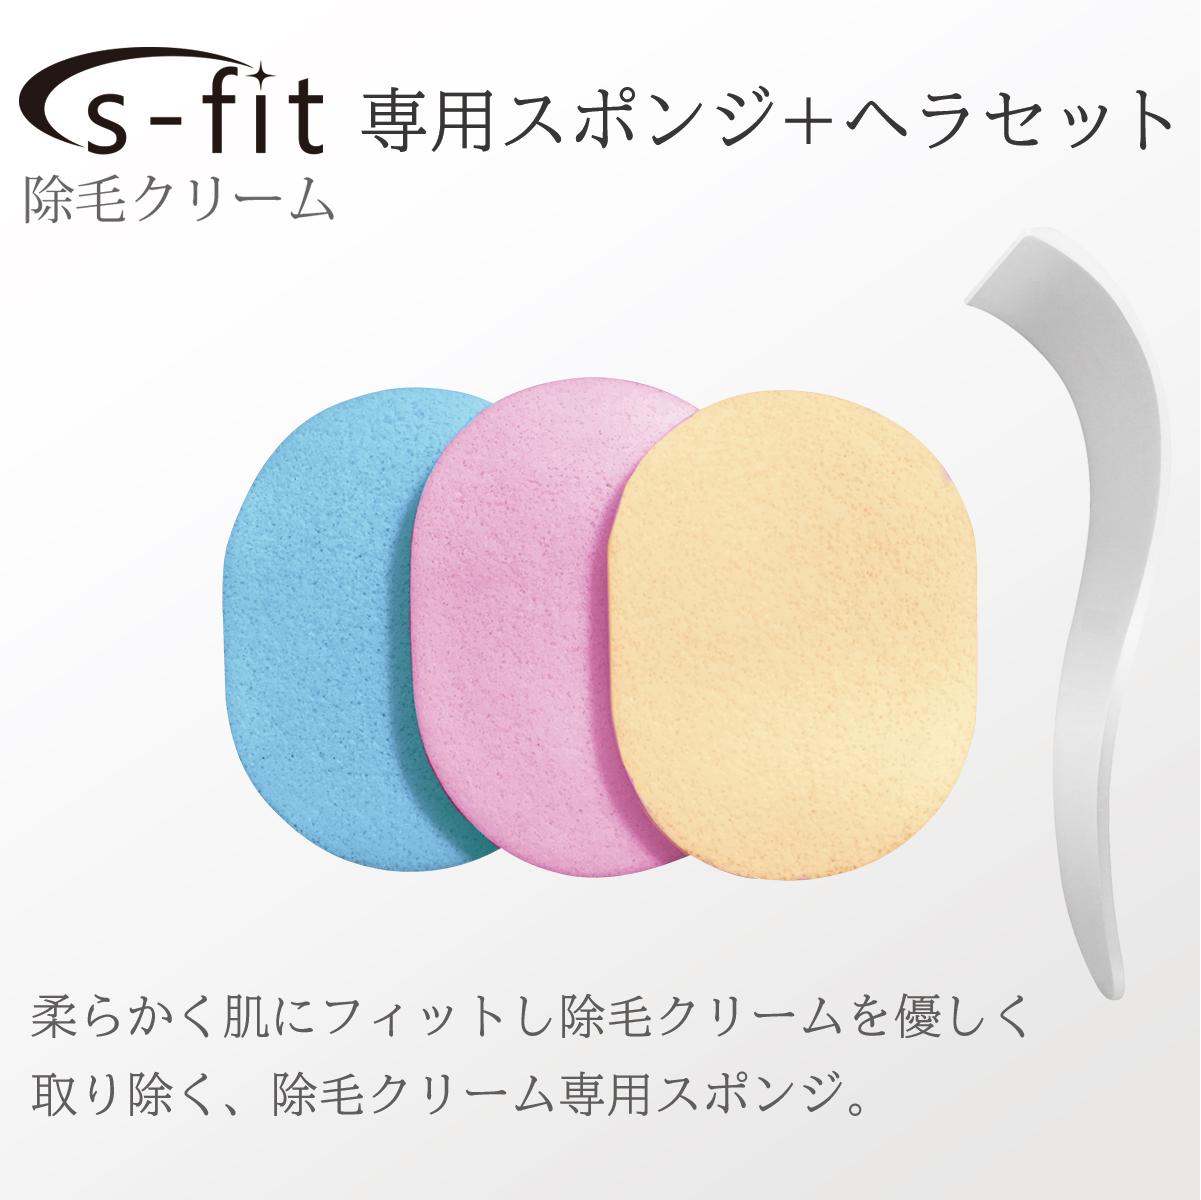 S-fit 除毛クリーム 専用スポンジ+ヘラセット